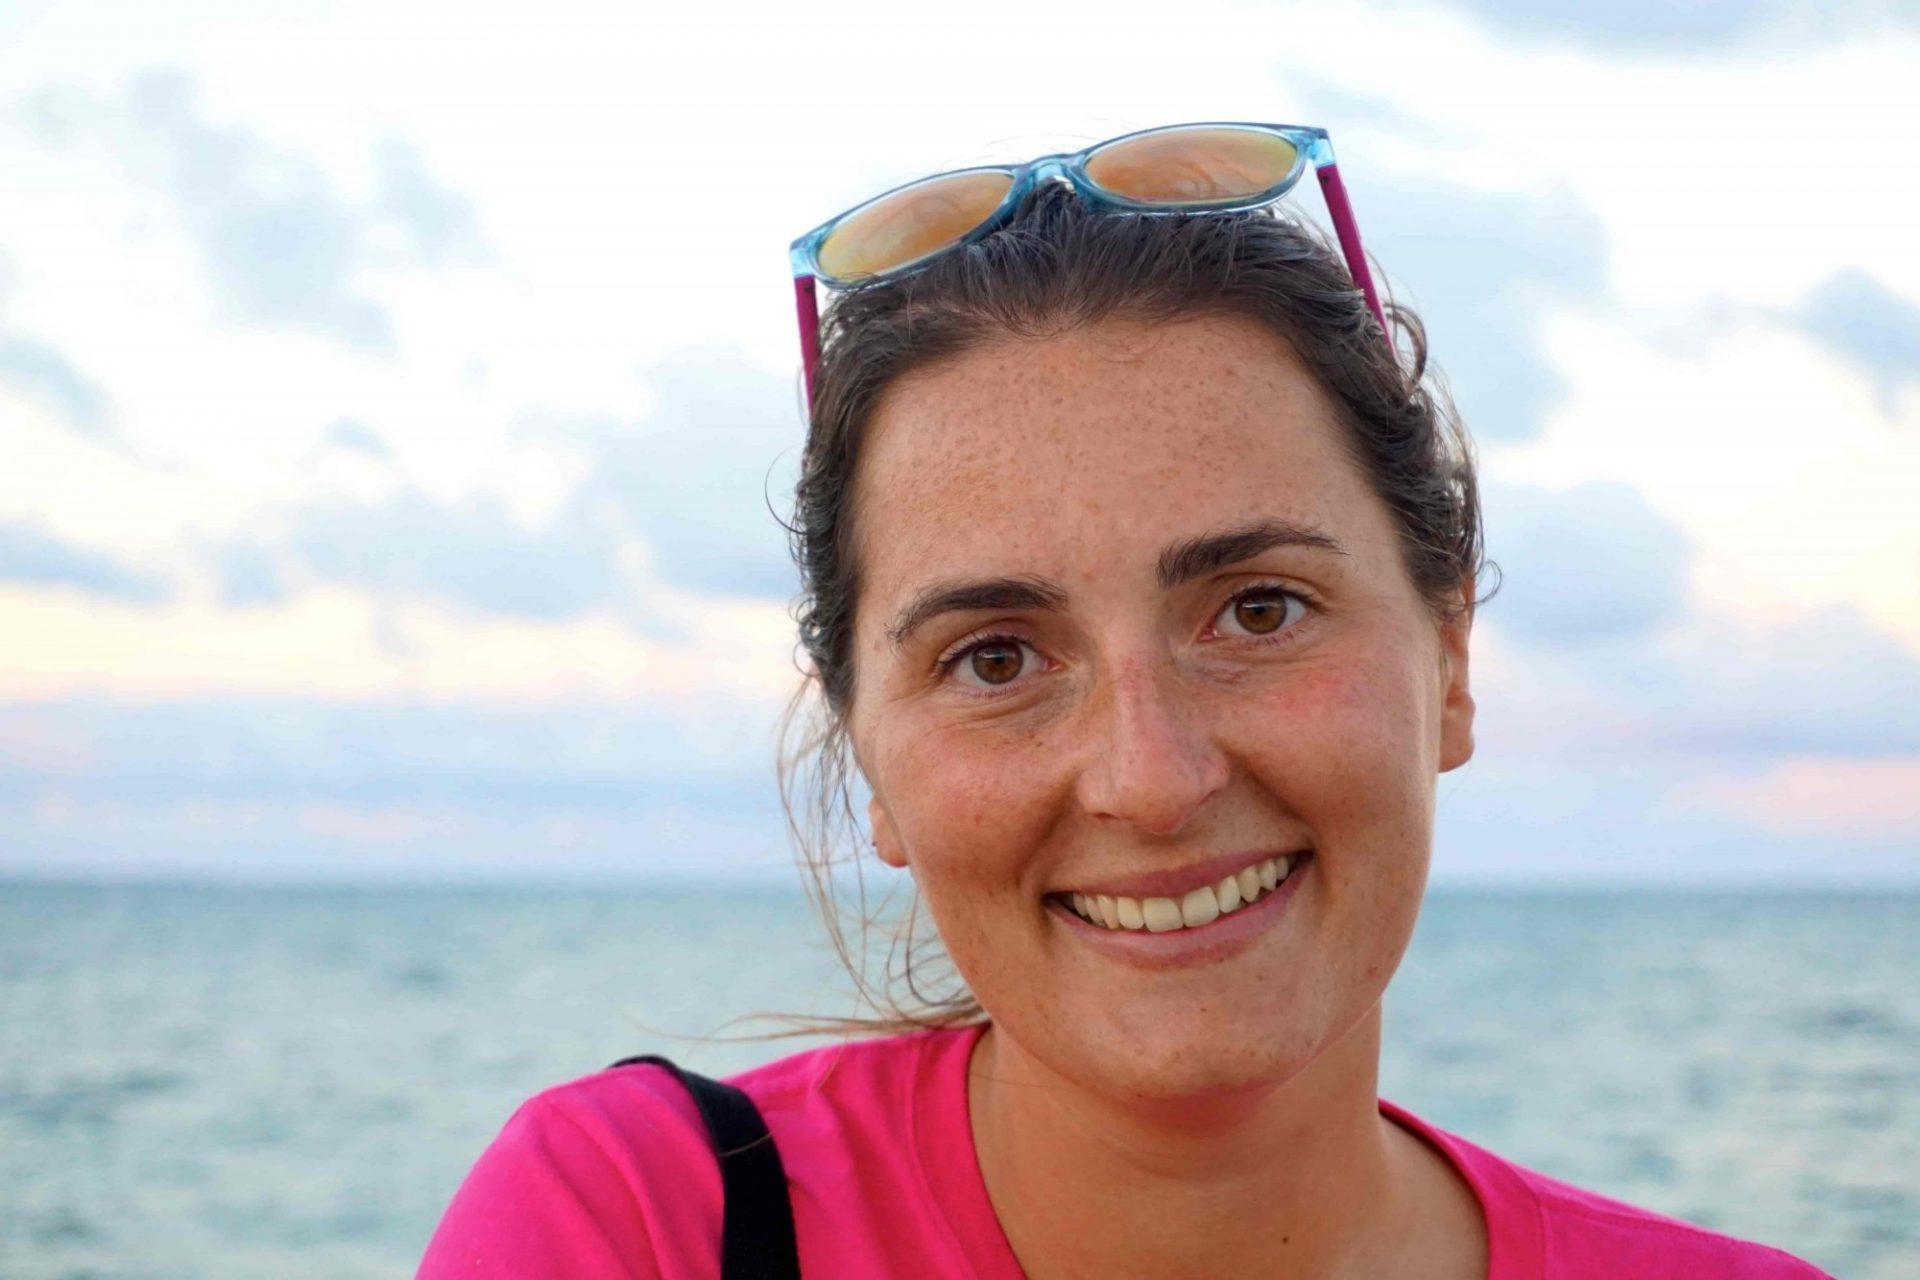 Sarah-azores-on-board-skipper-lets-sea-ferias-veleiro-barco